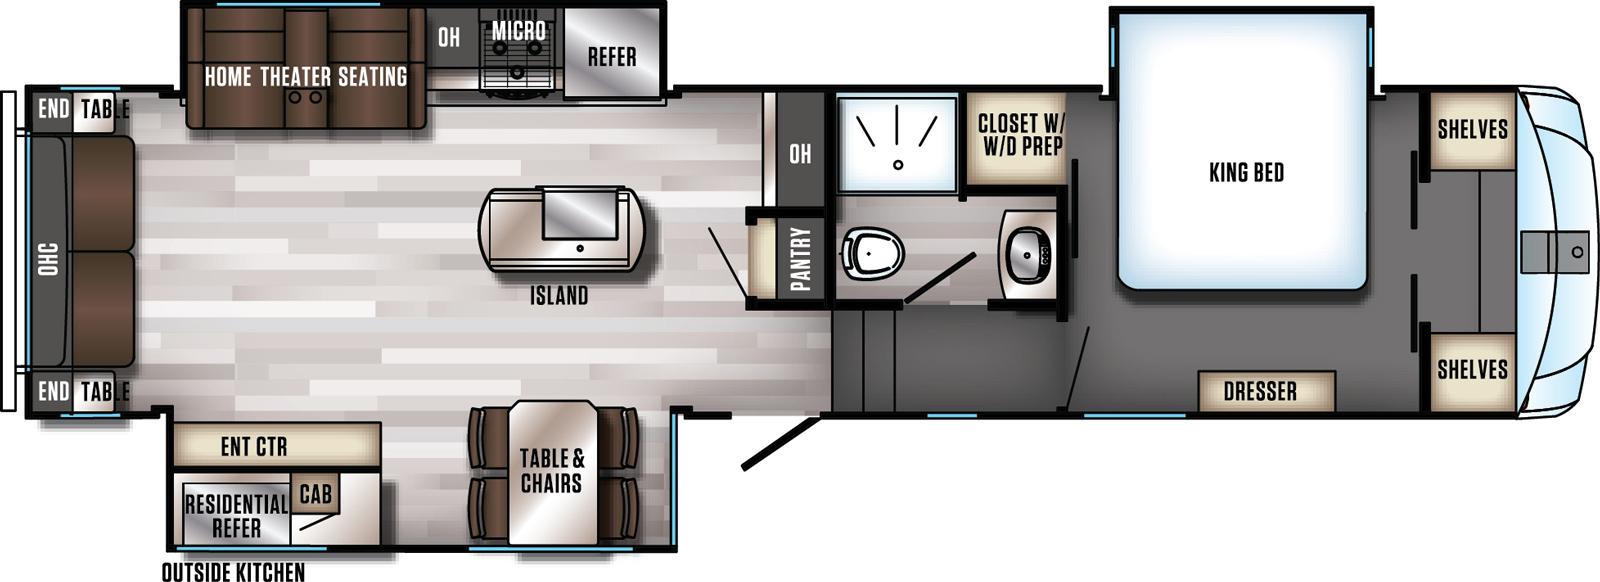 Diagram of Arctic Wolf Suite Floorplan layout